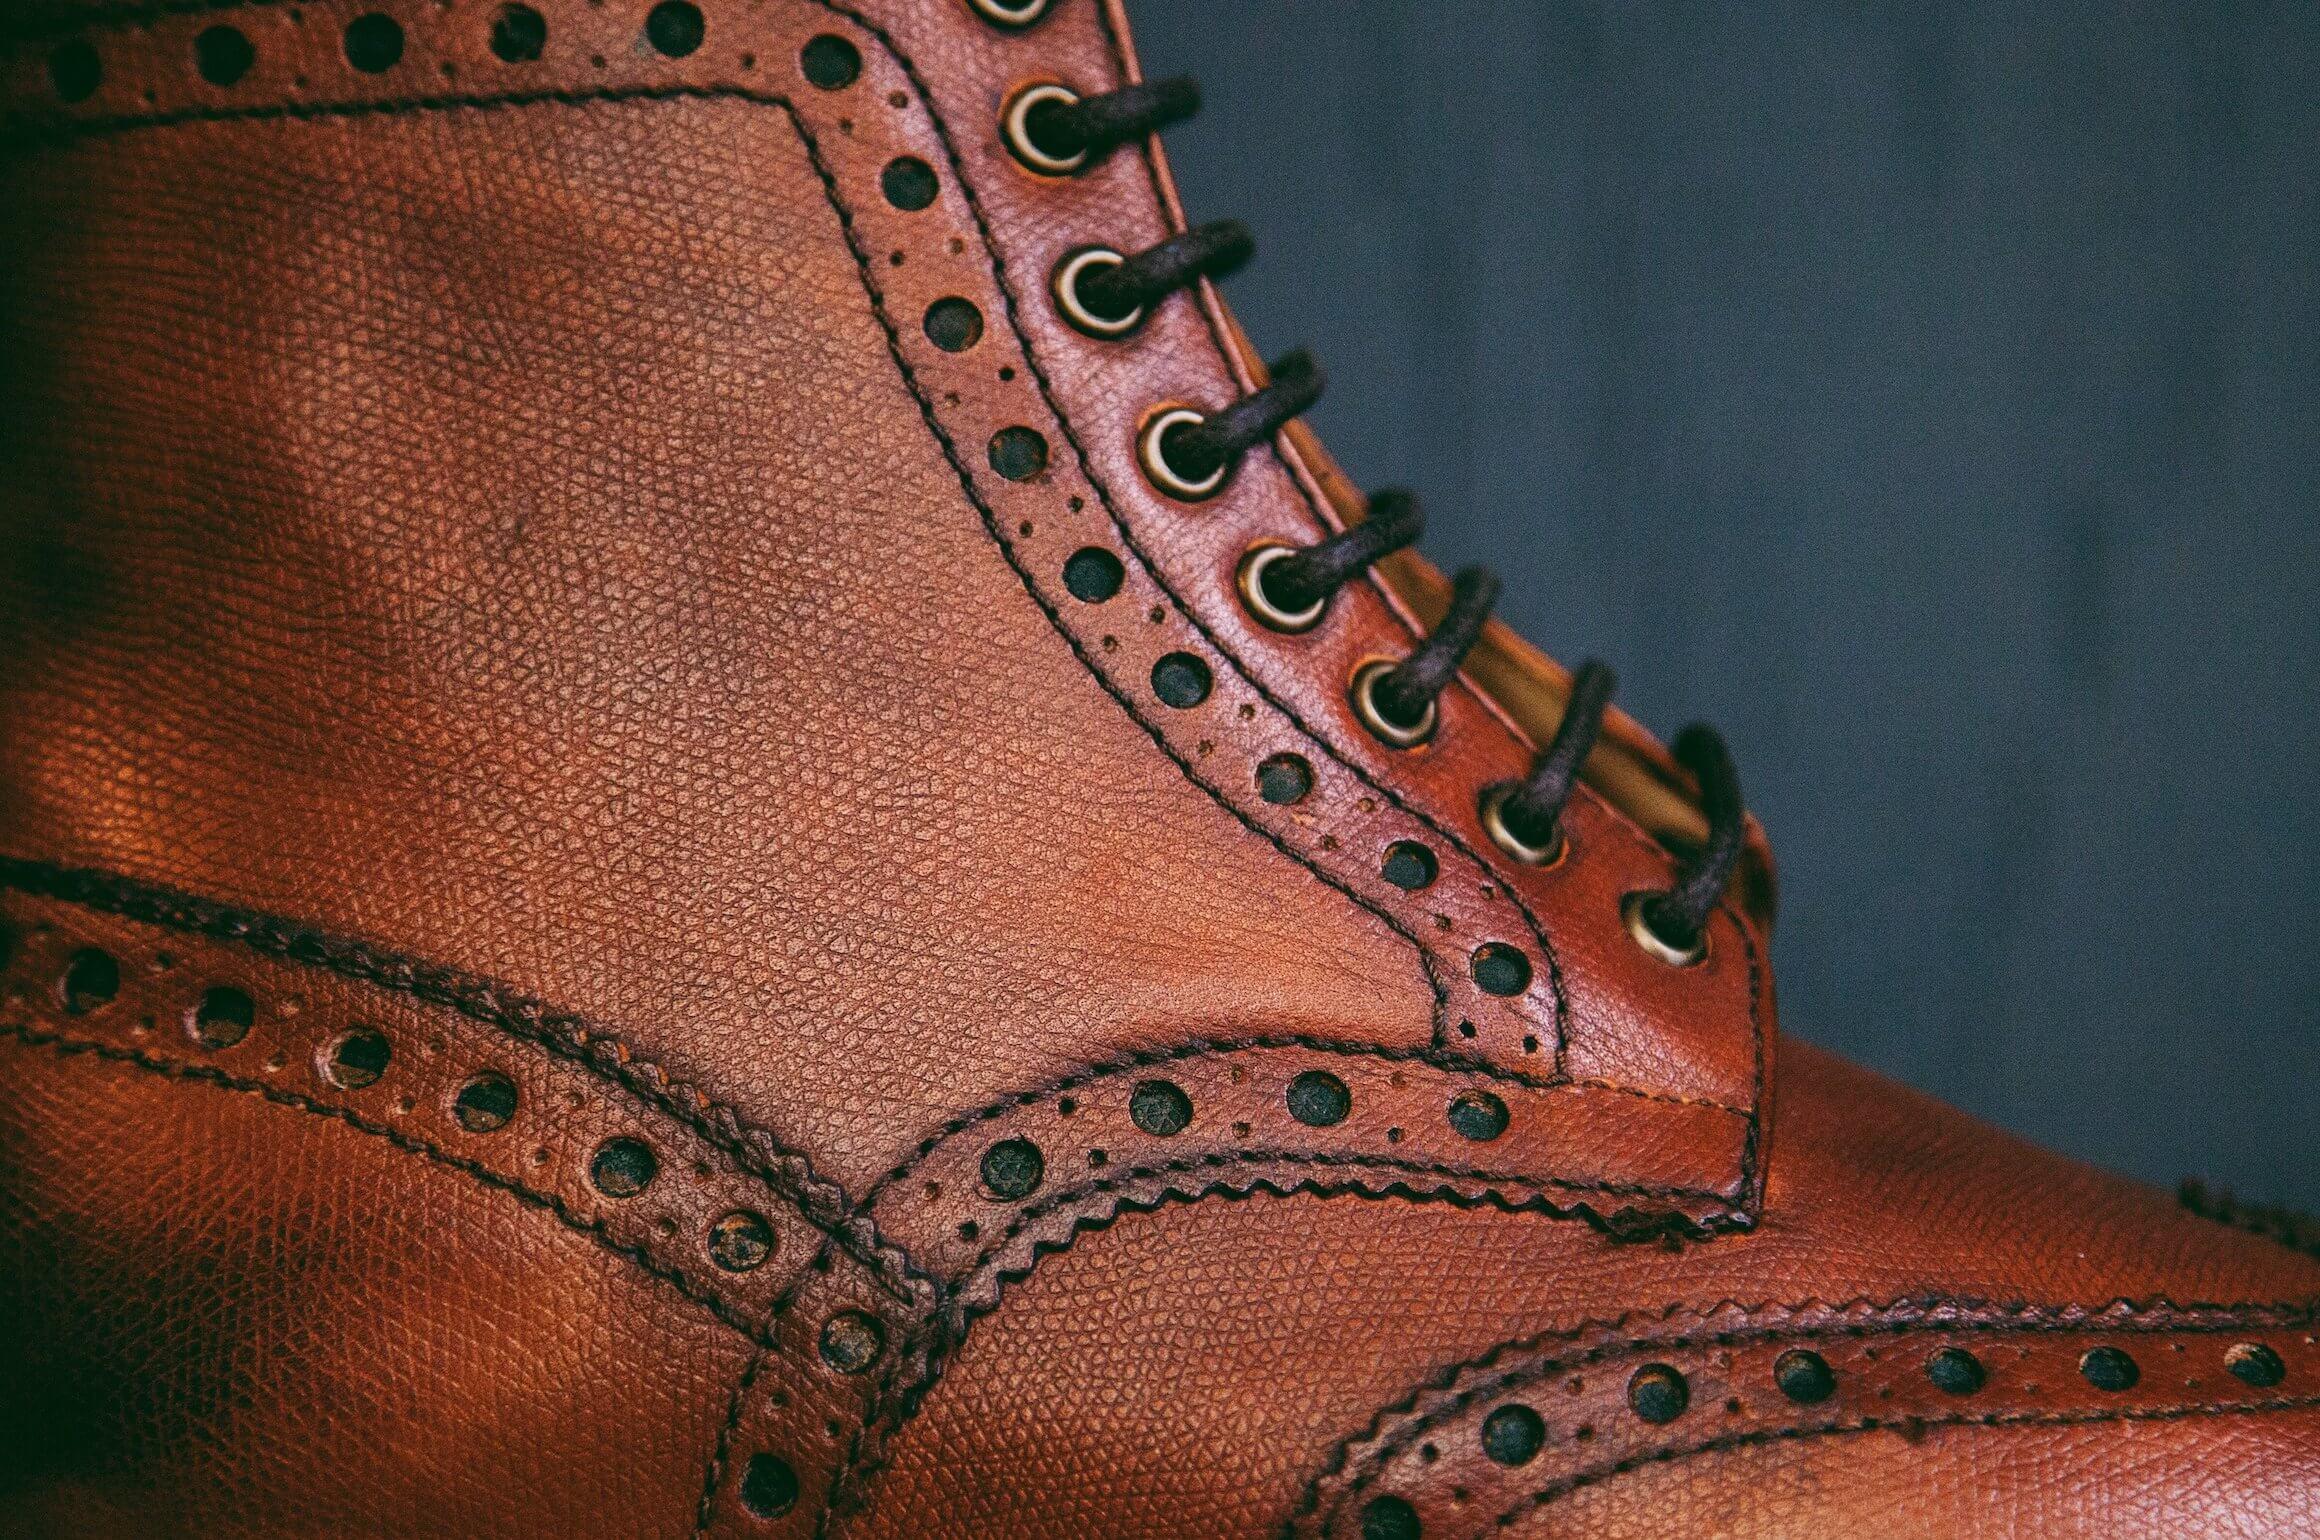 grenson brogue boots